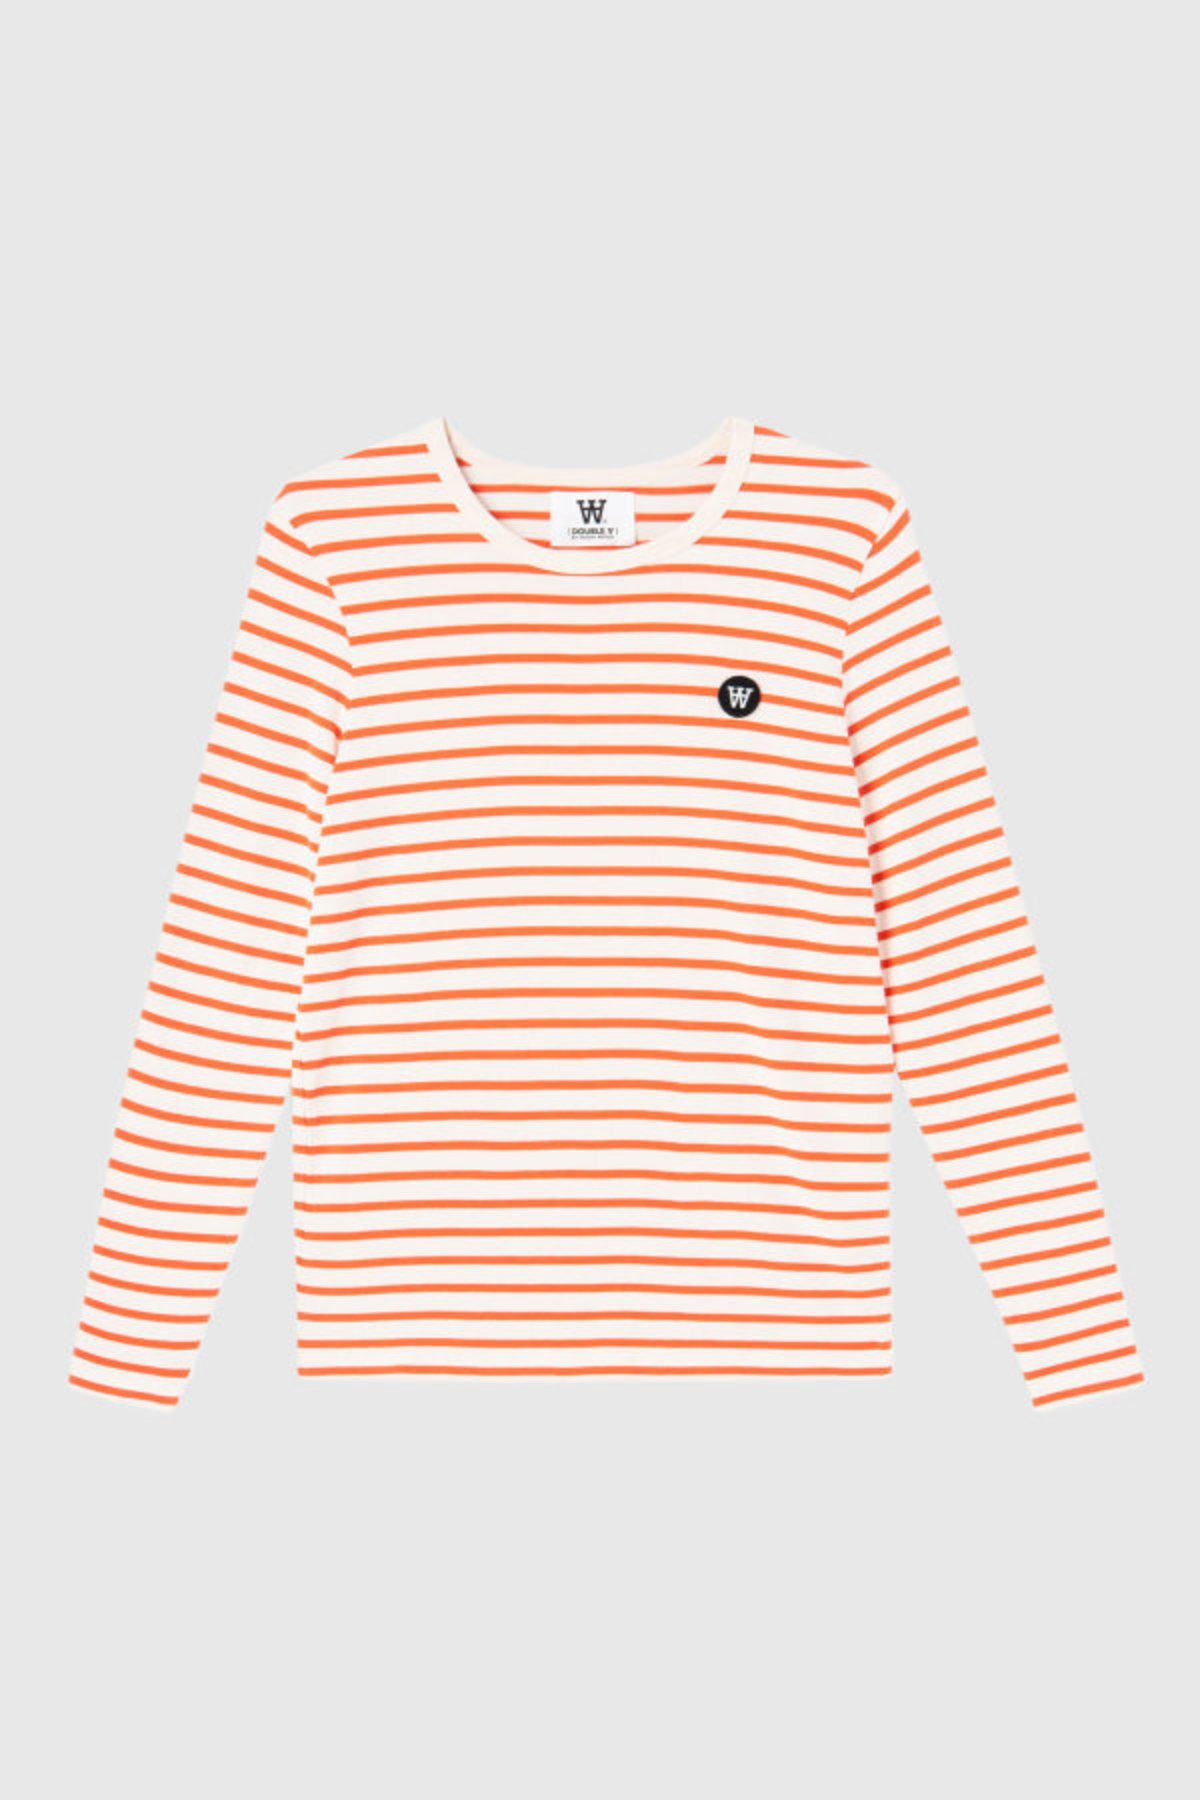 6b492ce1272 Wood Wood Moa L\S T-Shirt - Off White/Orange Stripe | Garmentory